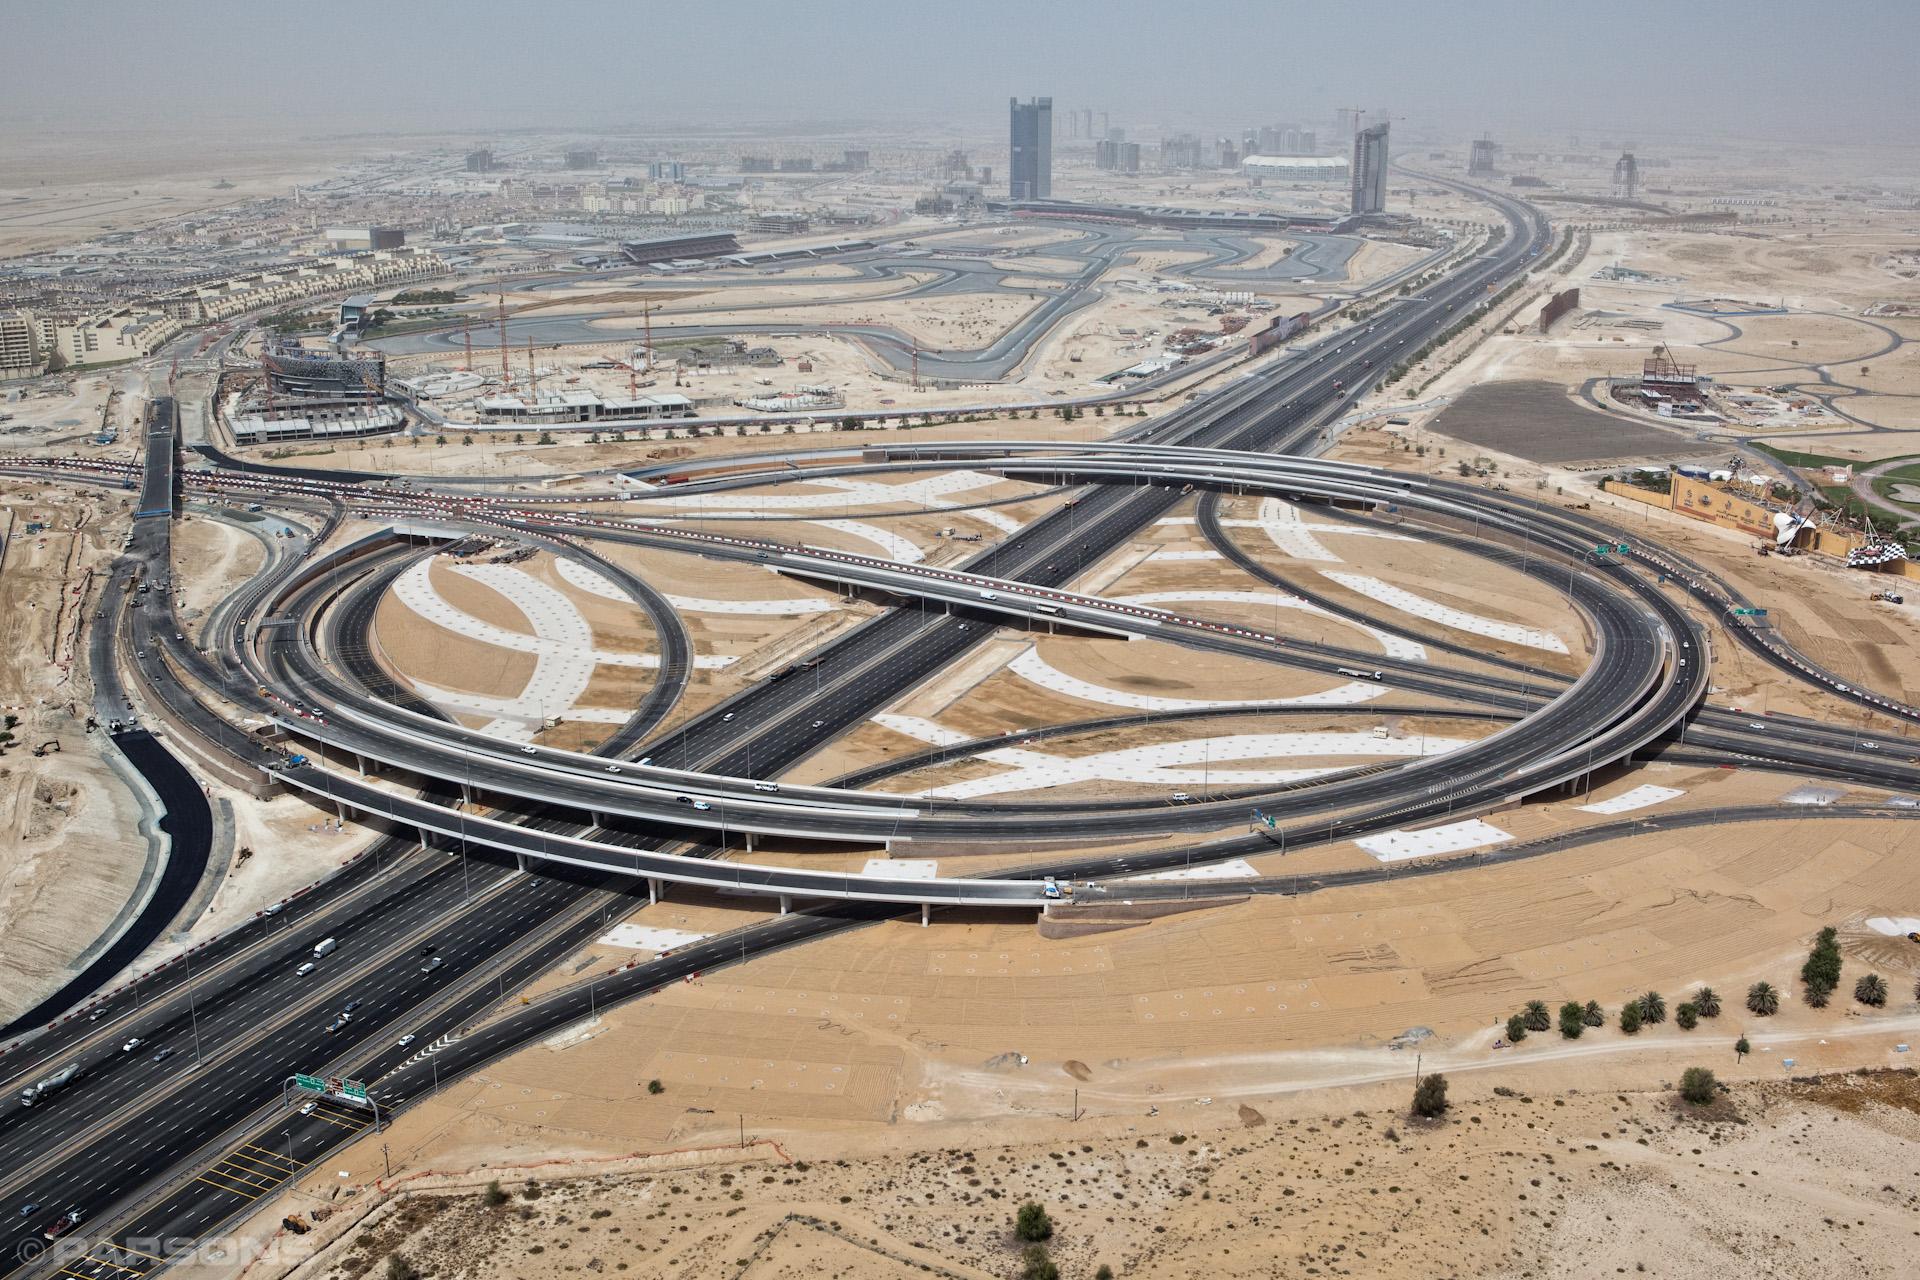 Civil-Engineering-Aerial-Dubai-Arabian-Ranches-Highway-UAE.JPG